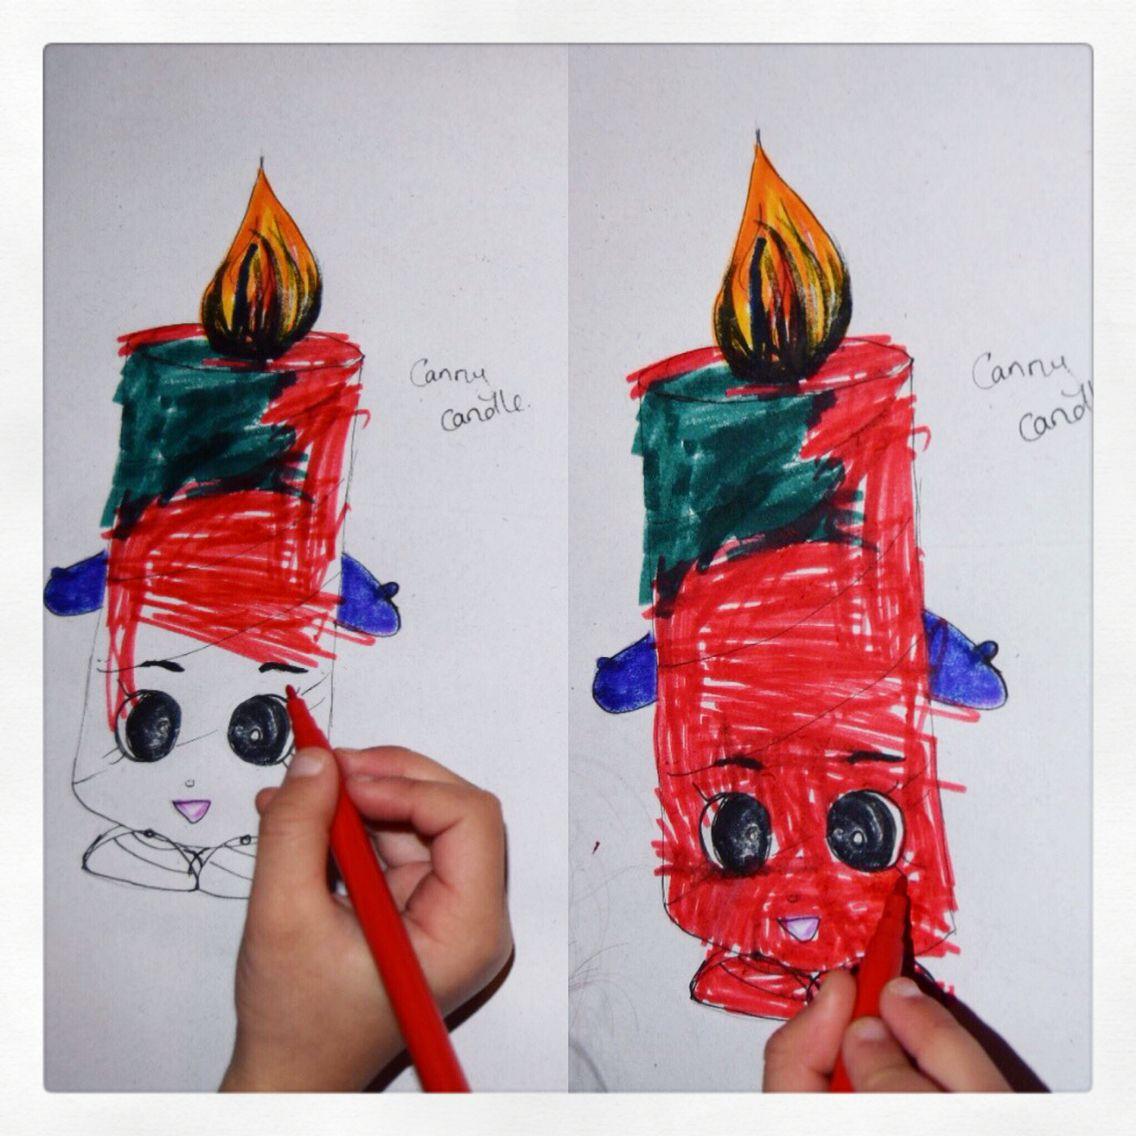 Sunday Shopkins doodle fun. @shopkinsworld  #shopkins #art #creative #colouring #drawing #kids #fun #activity #doodle #candle #toys #design